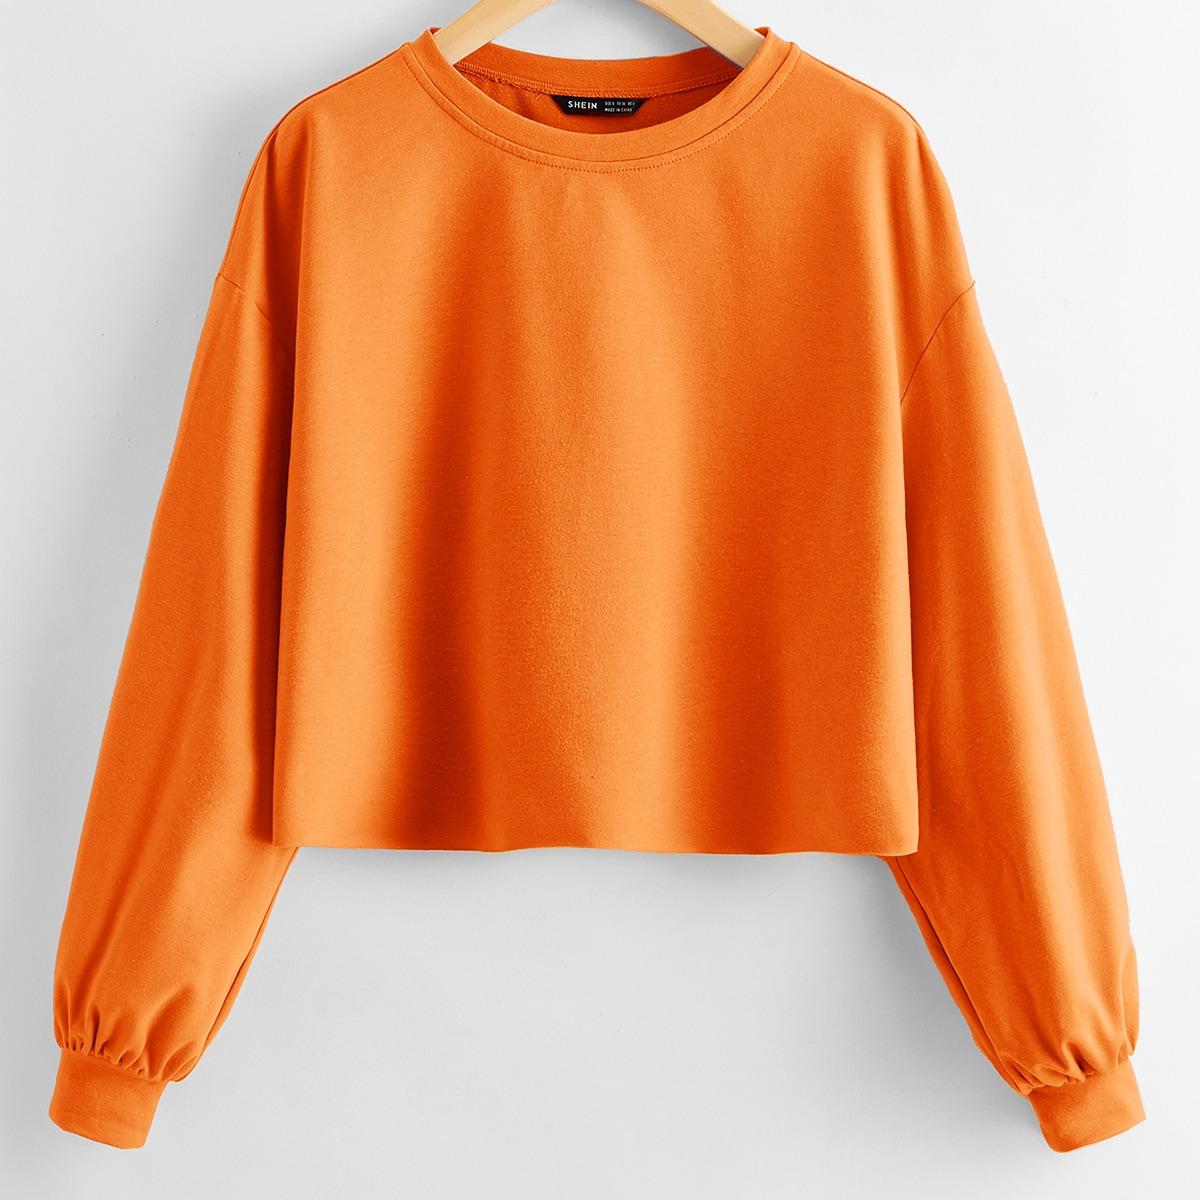 Однотонный короткий пуловер фото